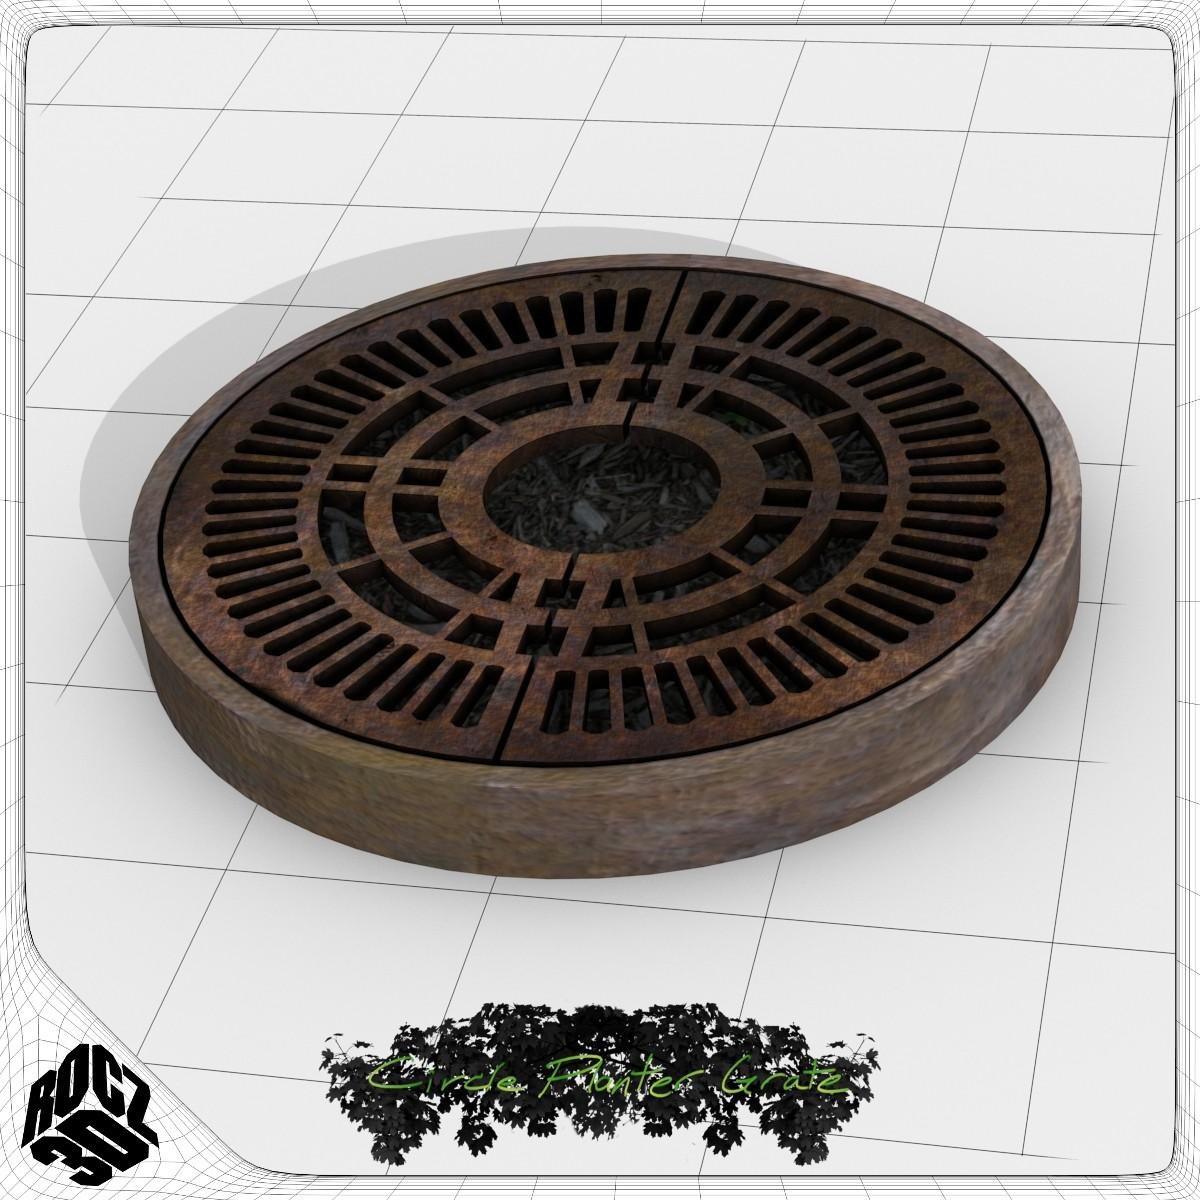 Planter Grate_Circle_3d Model_Textured.jpg